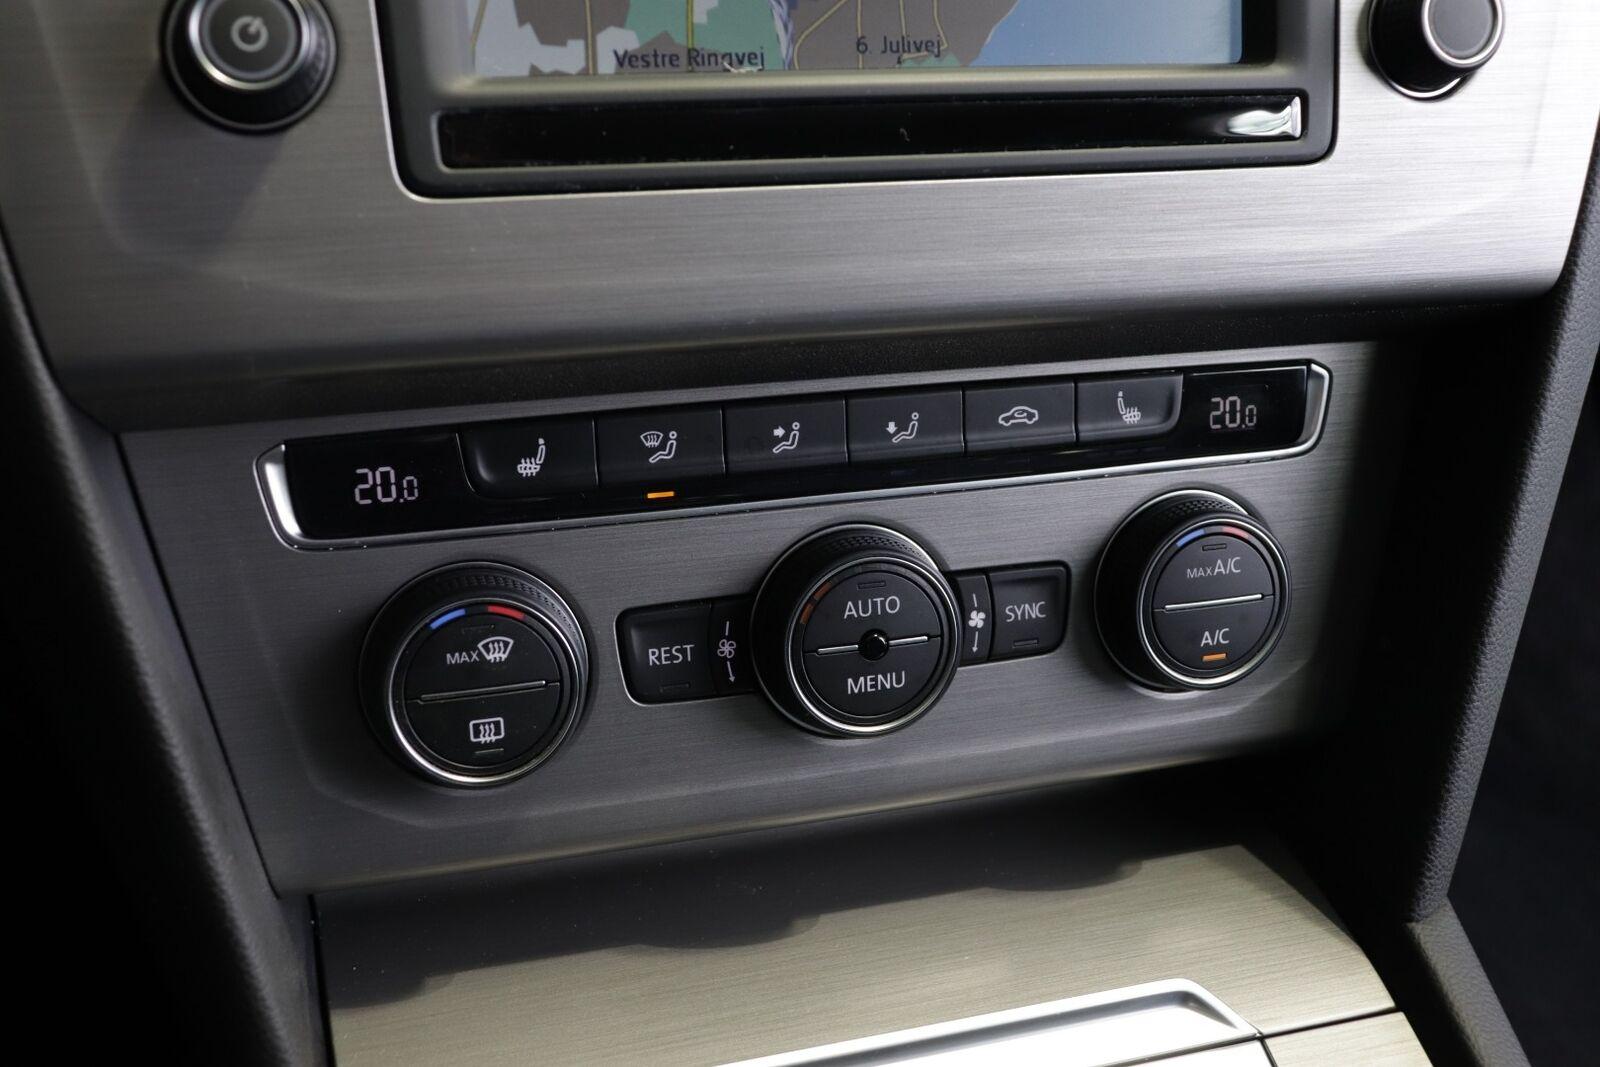 VW Passat TDi 120 BlueMotion Variant